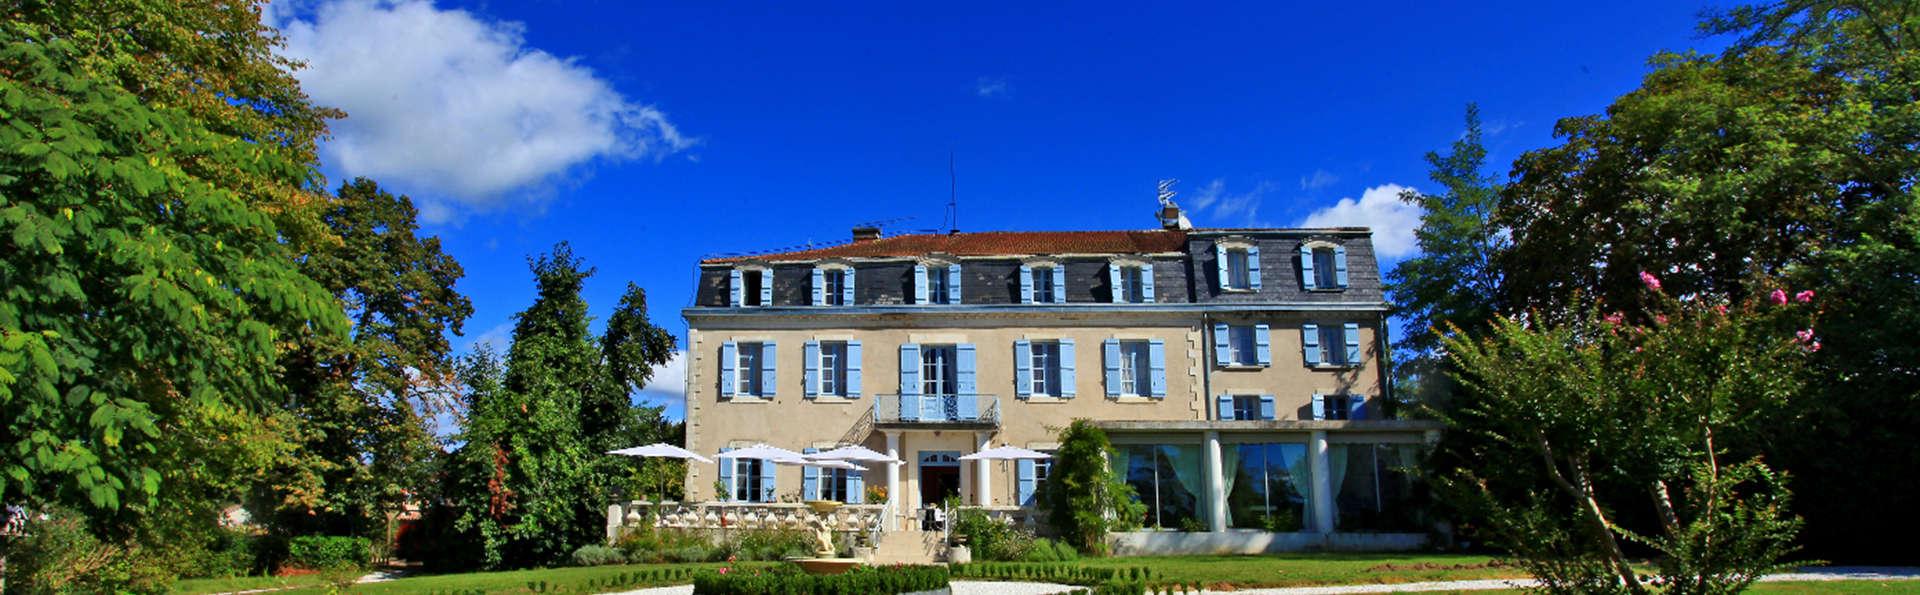 Château Bellevue  - EDIT_front.jpg